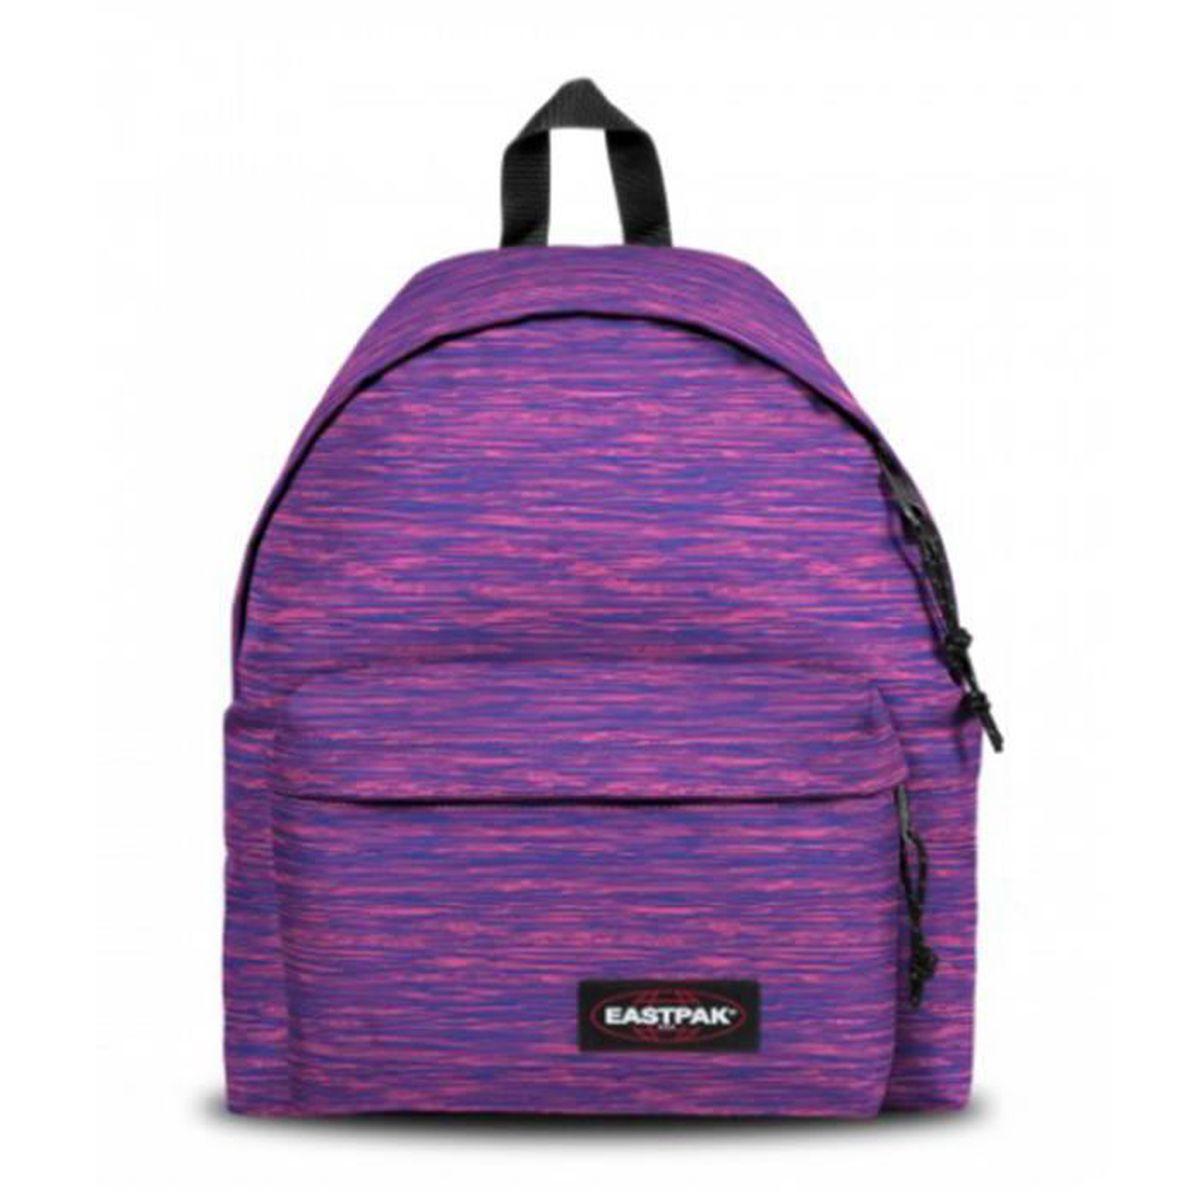 sac dos scolaire eastpak de la collection padded knit. Black Bedroom Furniture Sets. Home Design Ideas